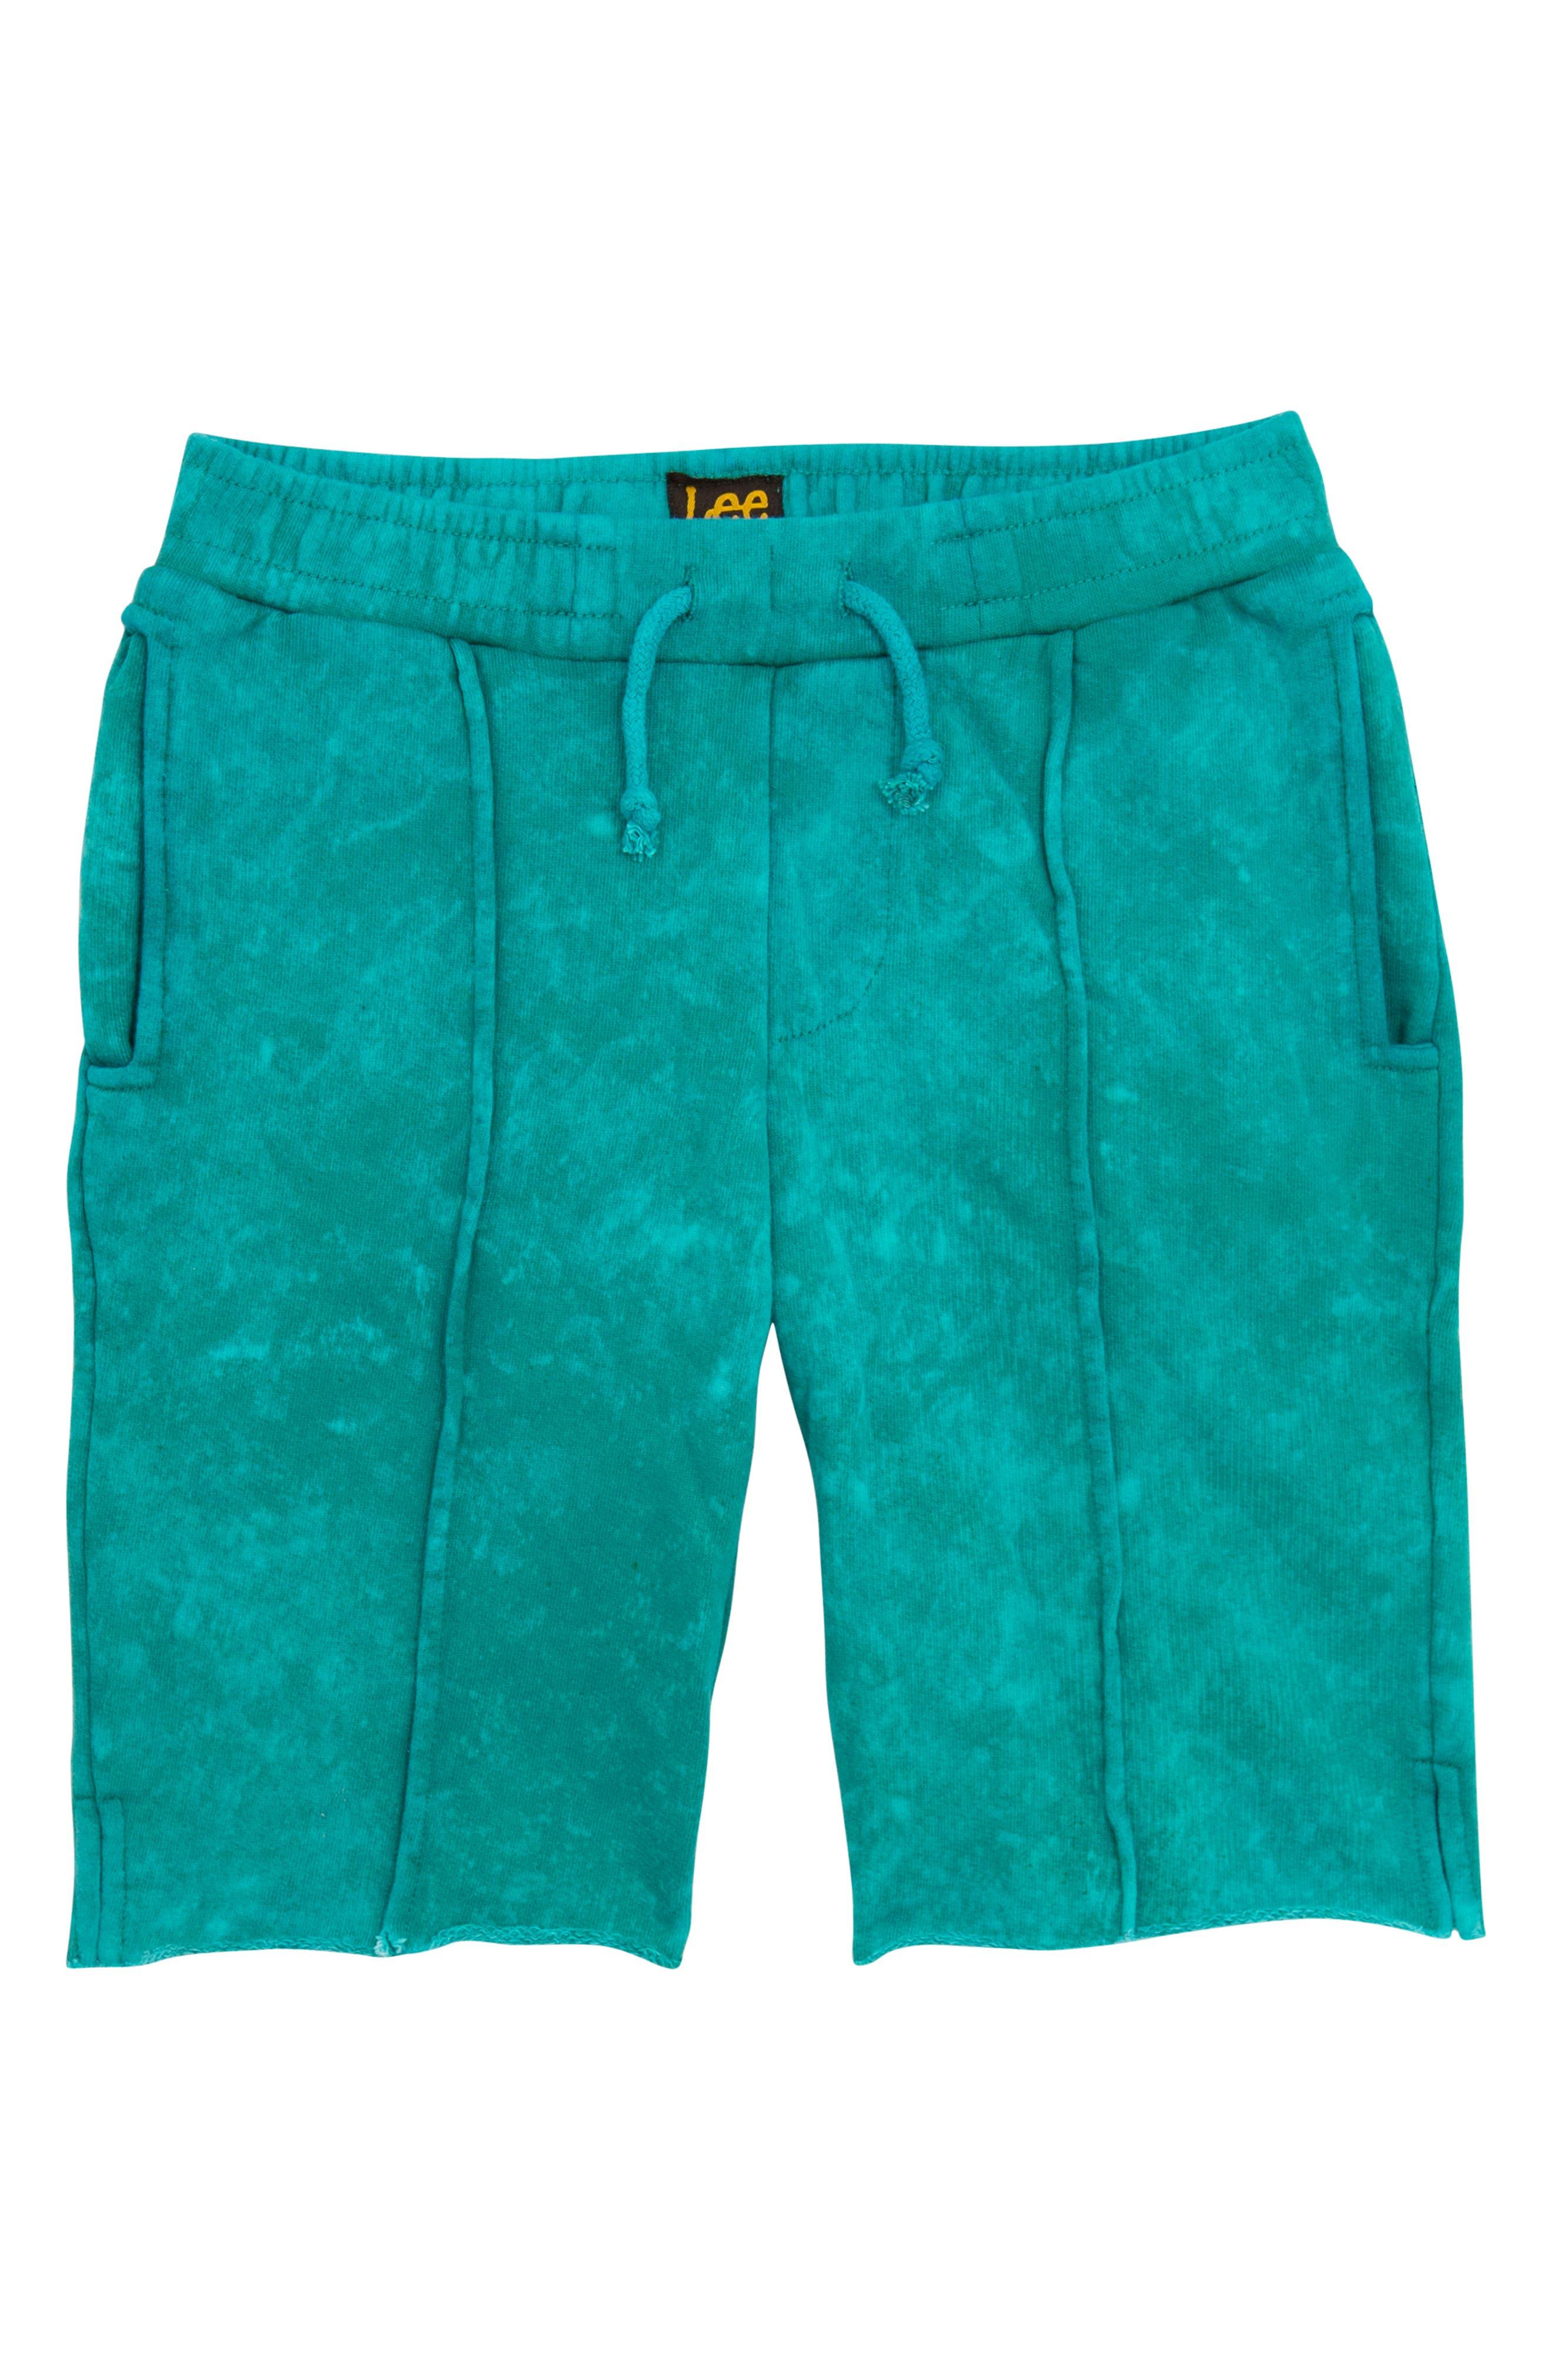 Acid Wash Pull-On Denim Shorts,                         Main,                         color, Turquoise